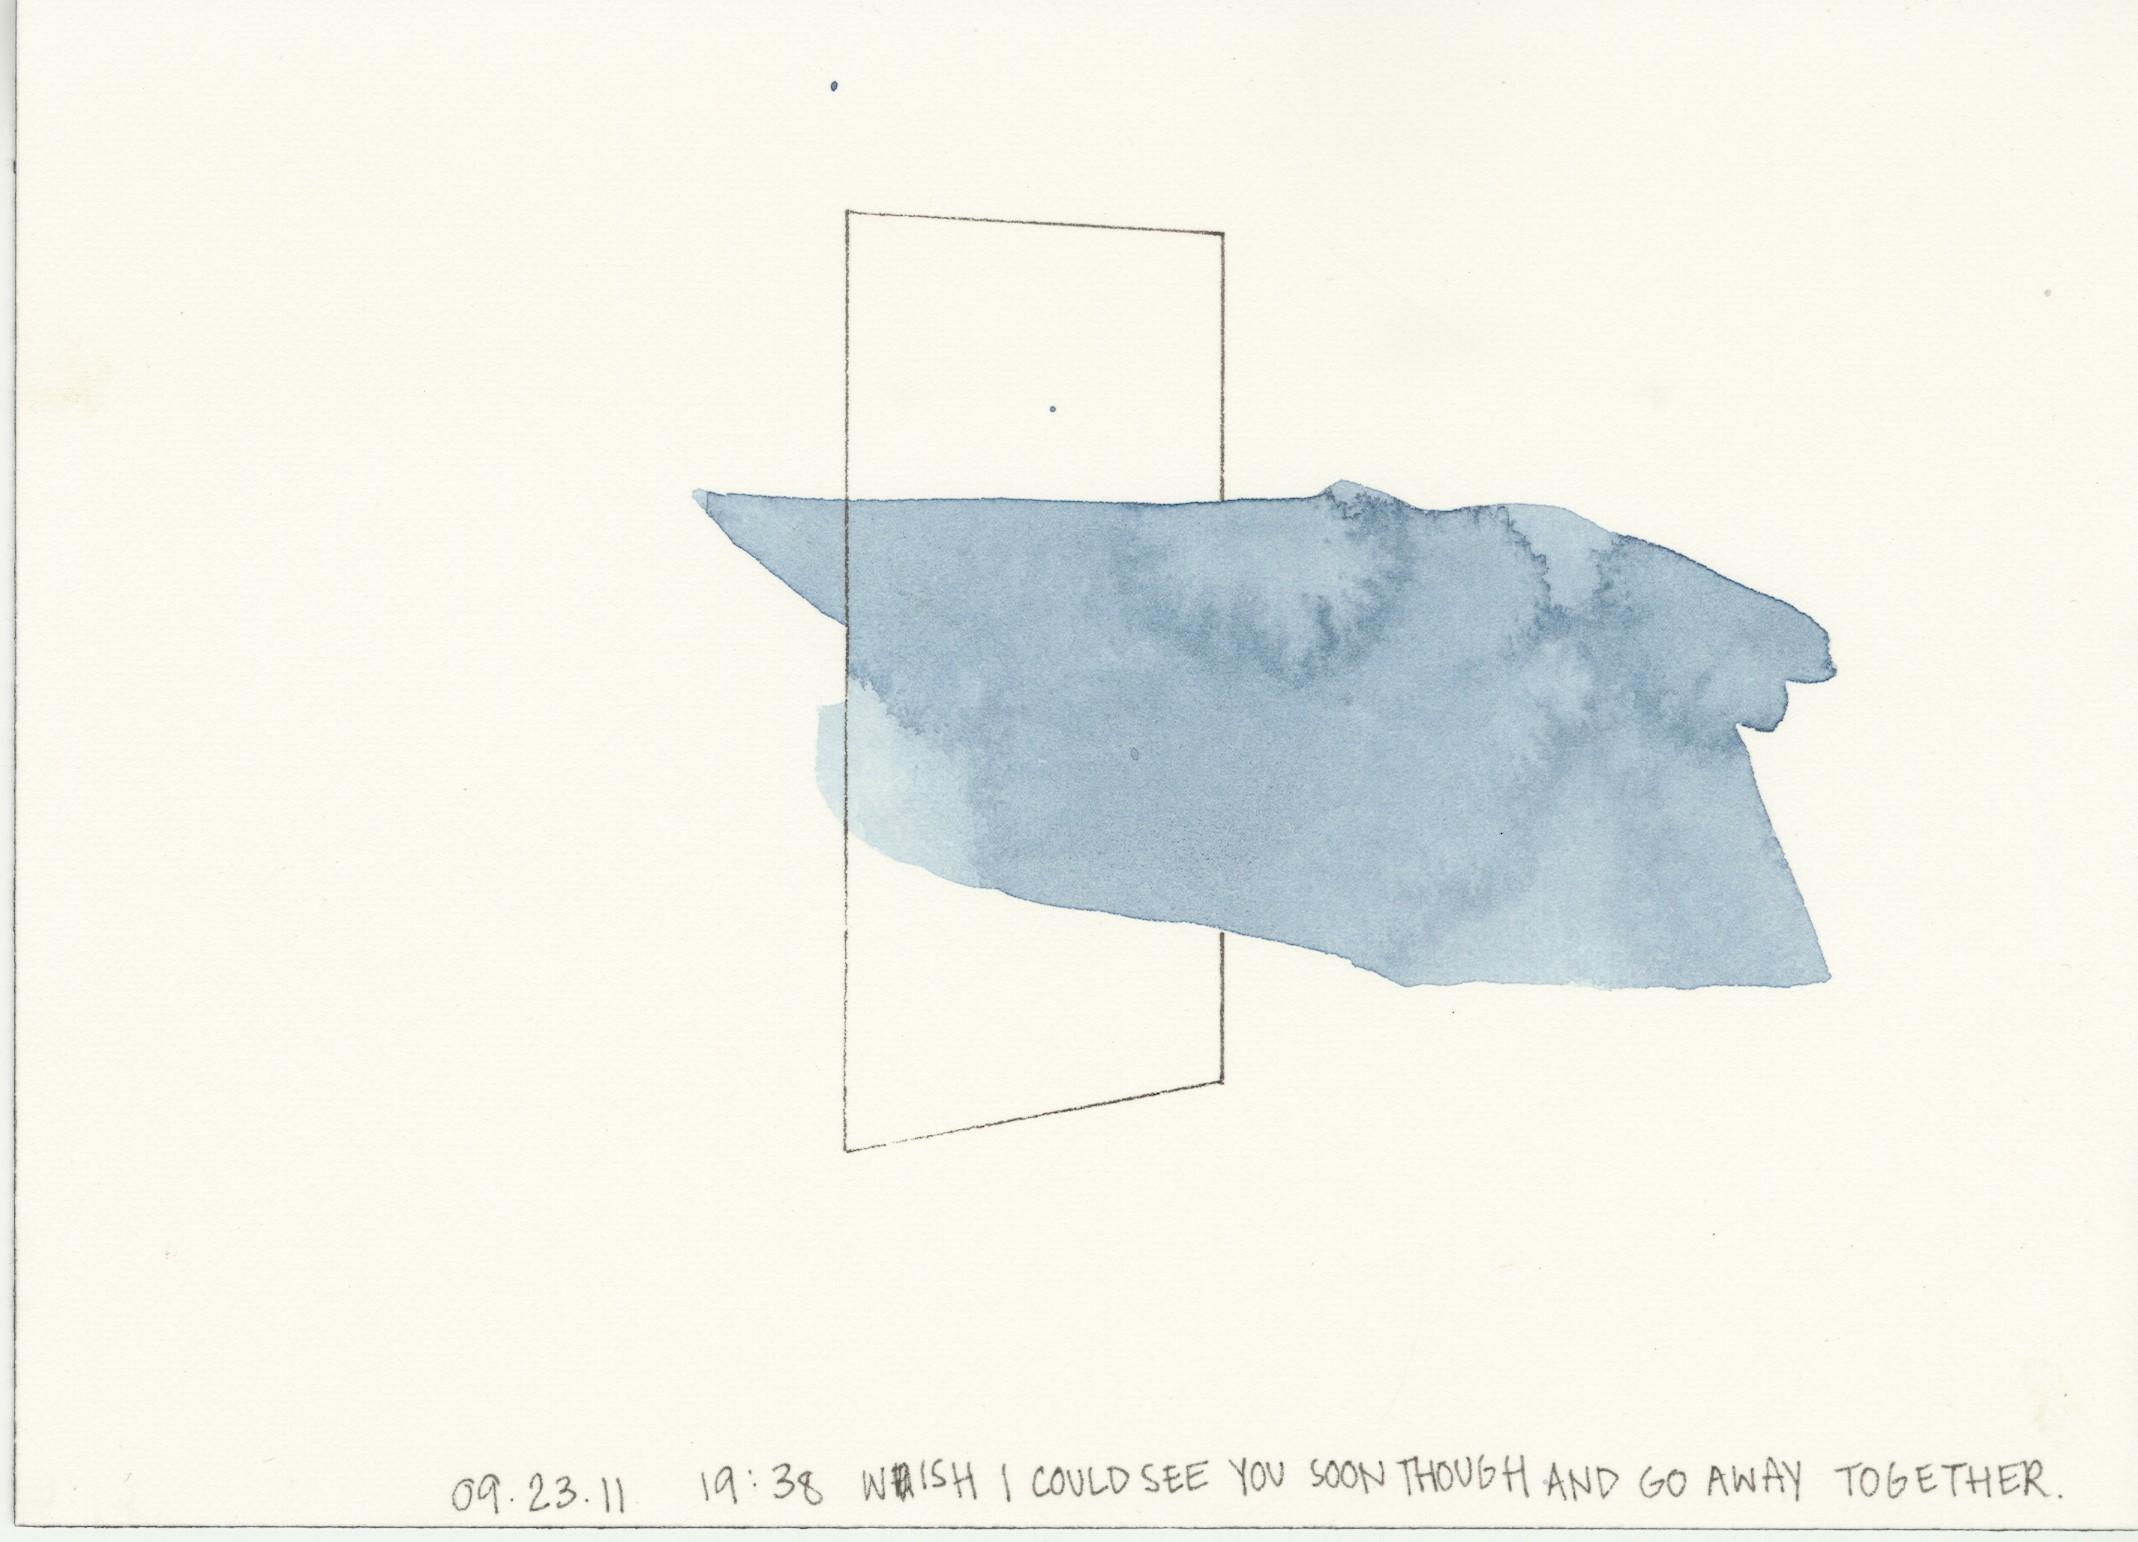 2011-10-28 drawing01.jpg